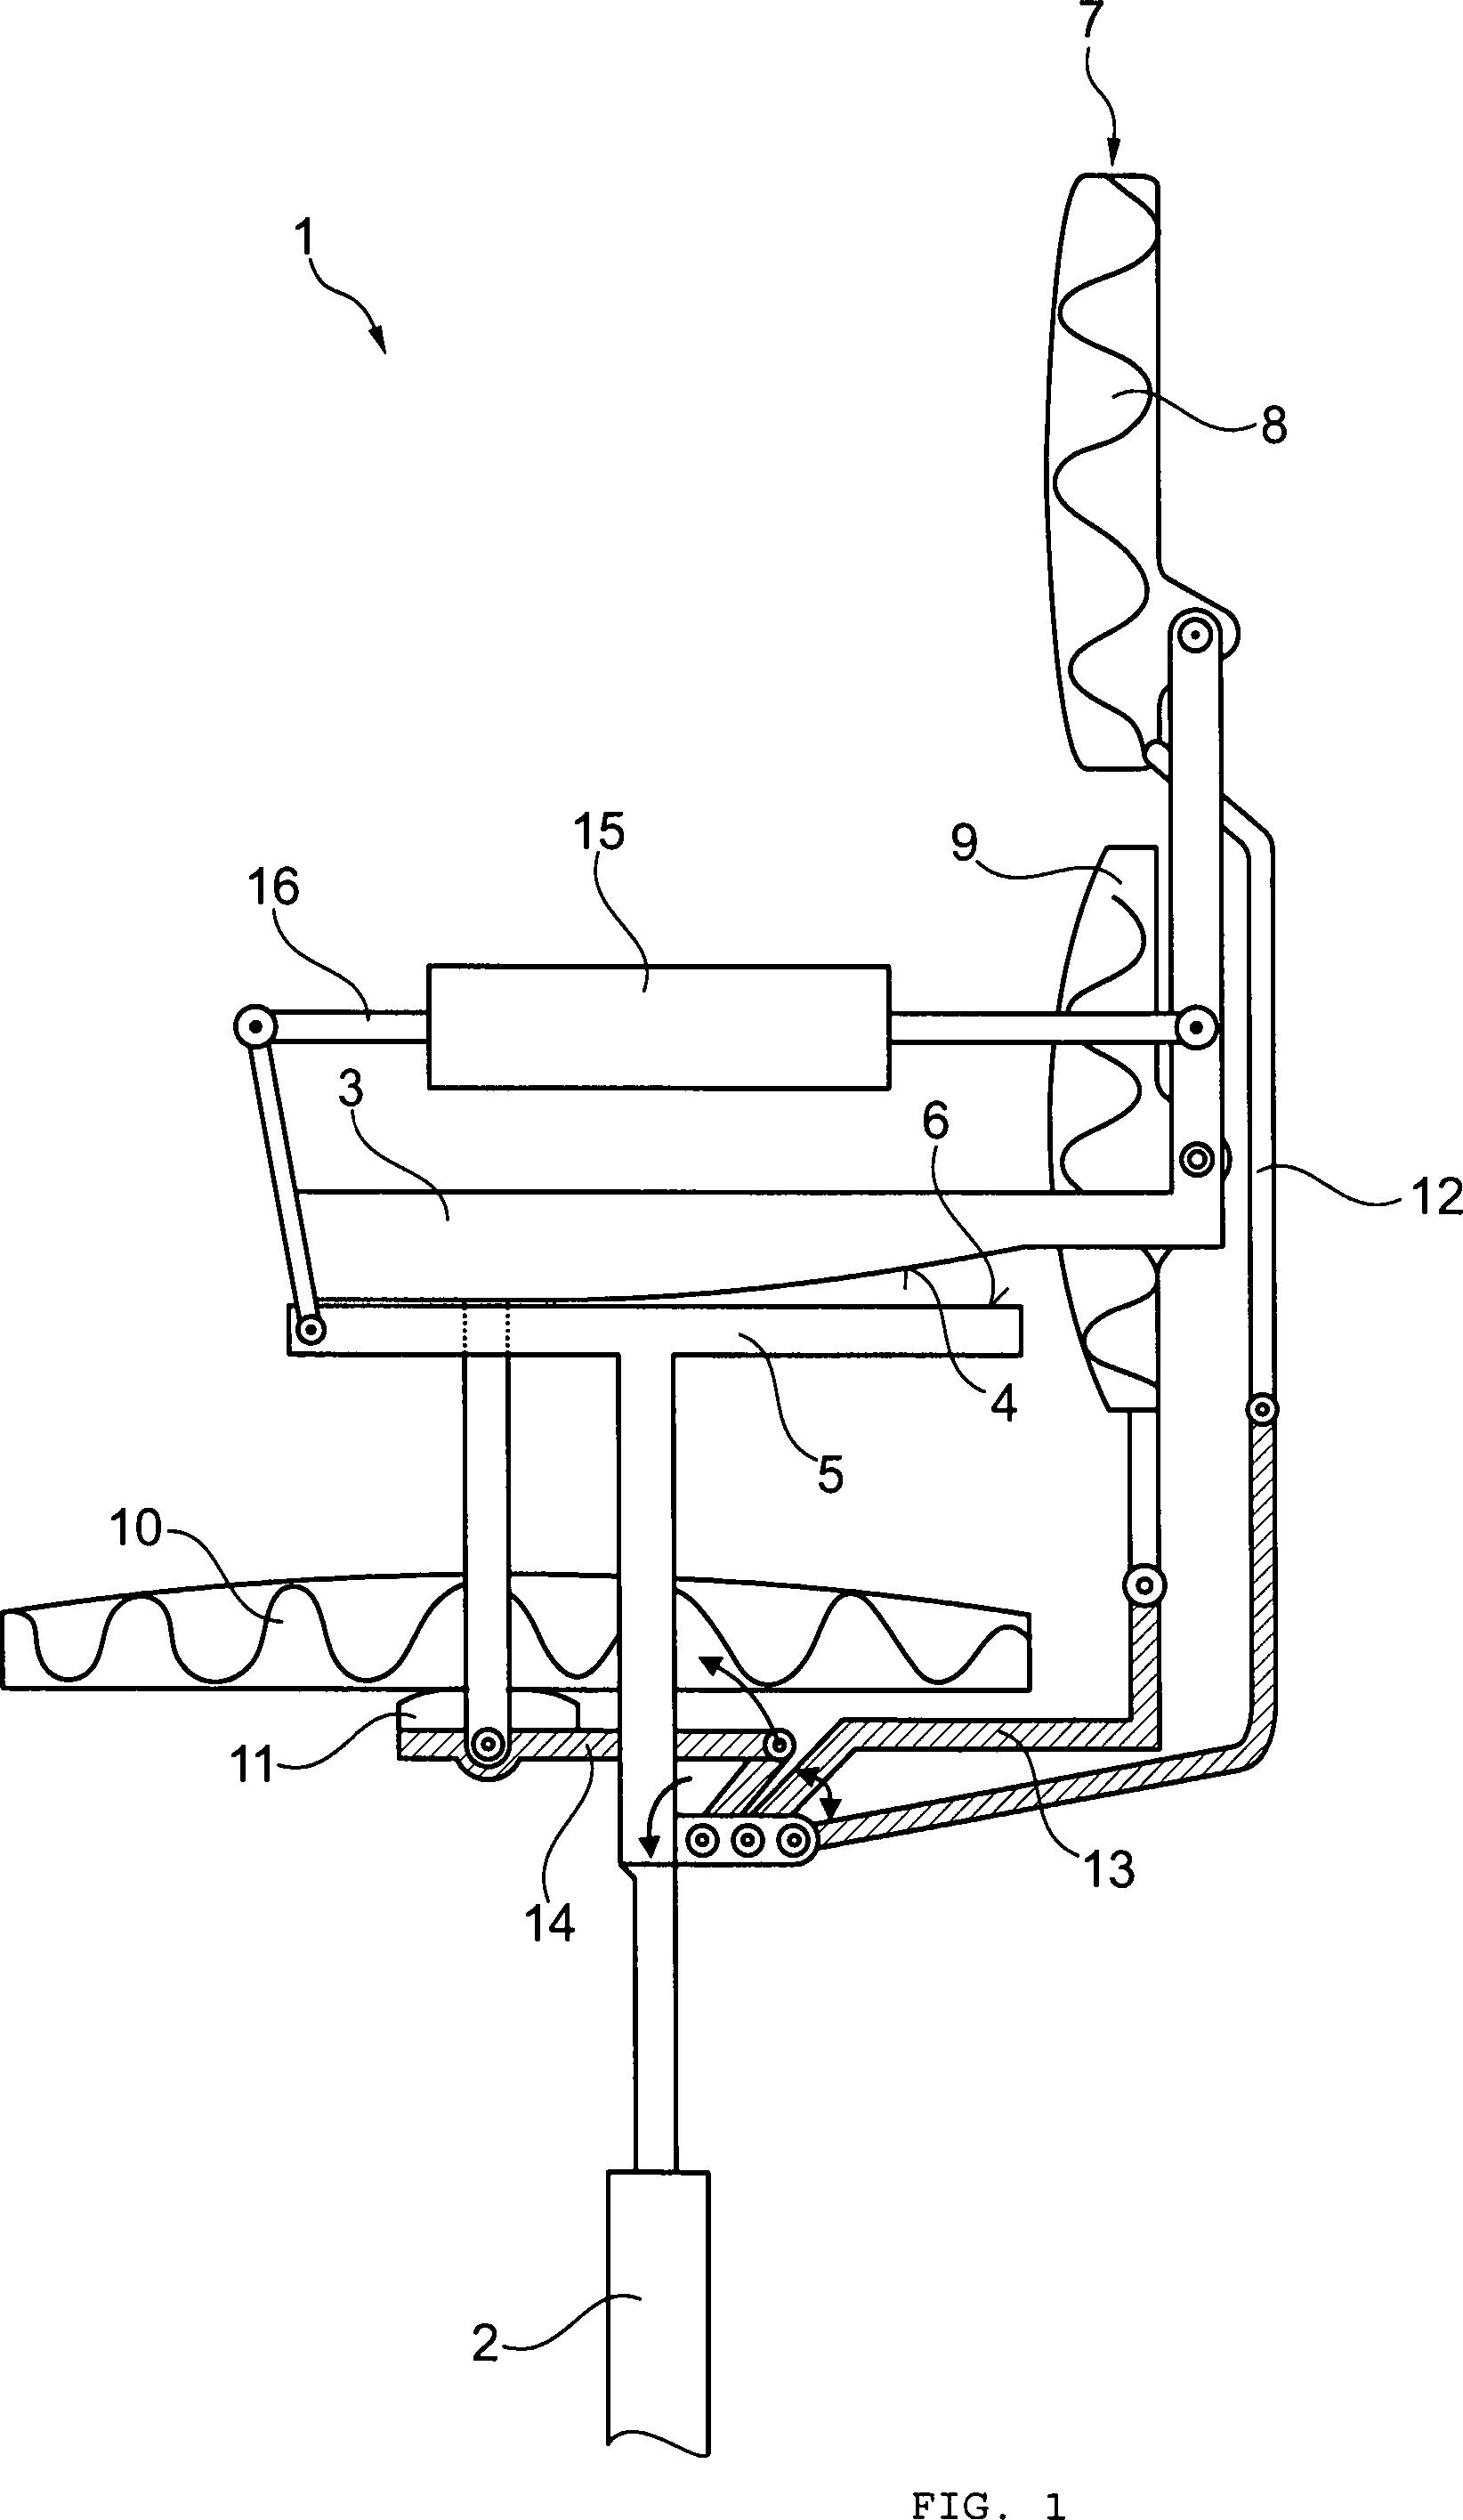 Patent de102012013299a1 stuhl insbesondere for Stuhl design dwg